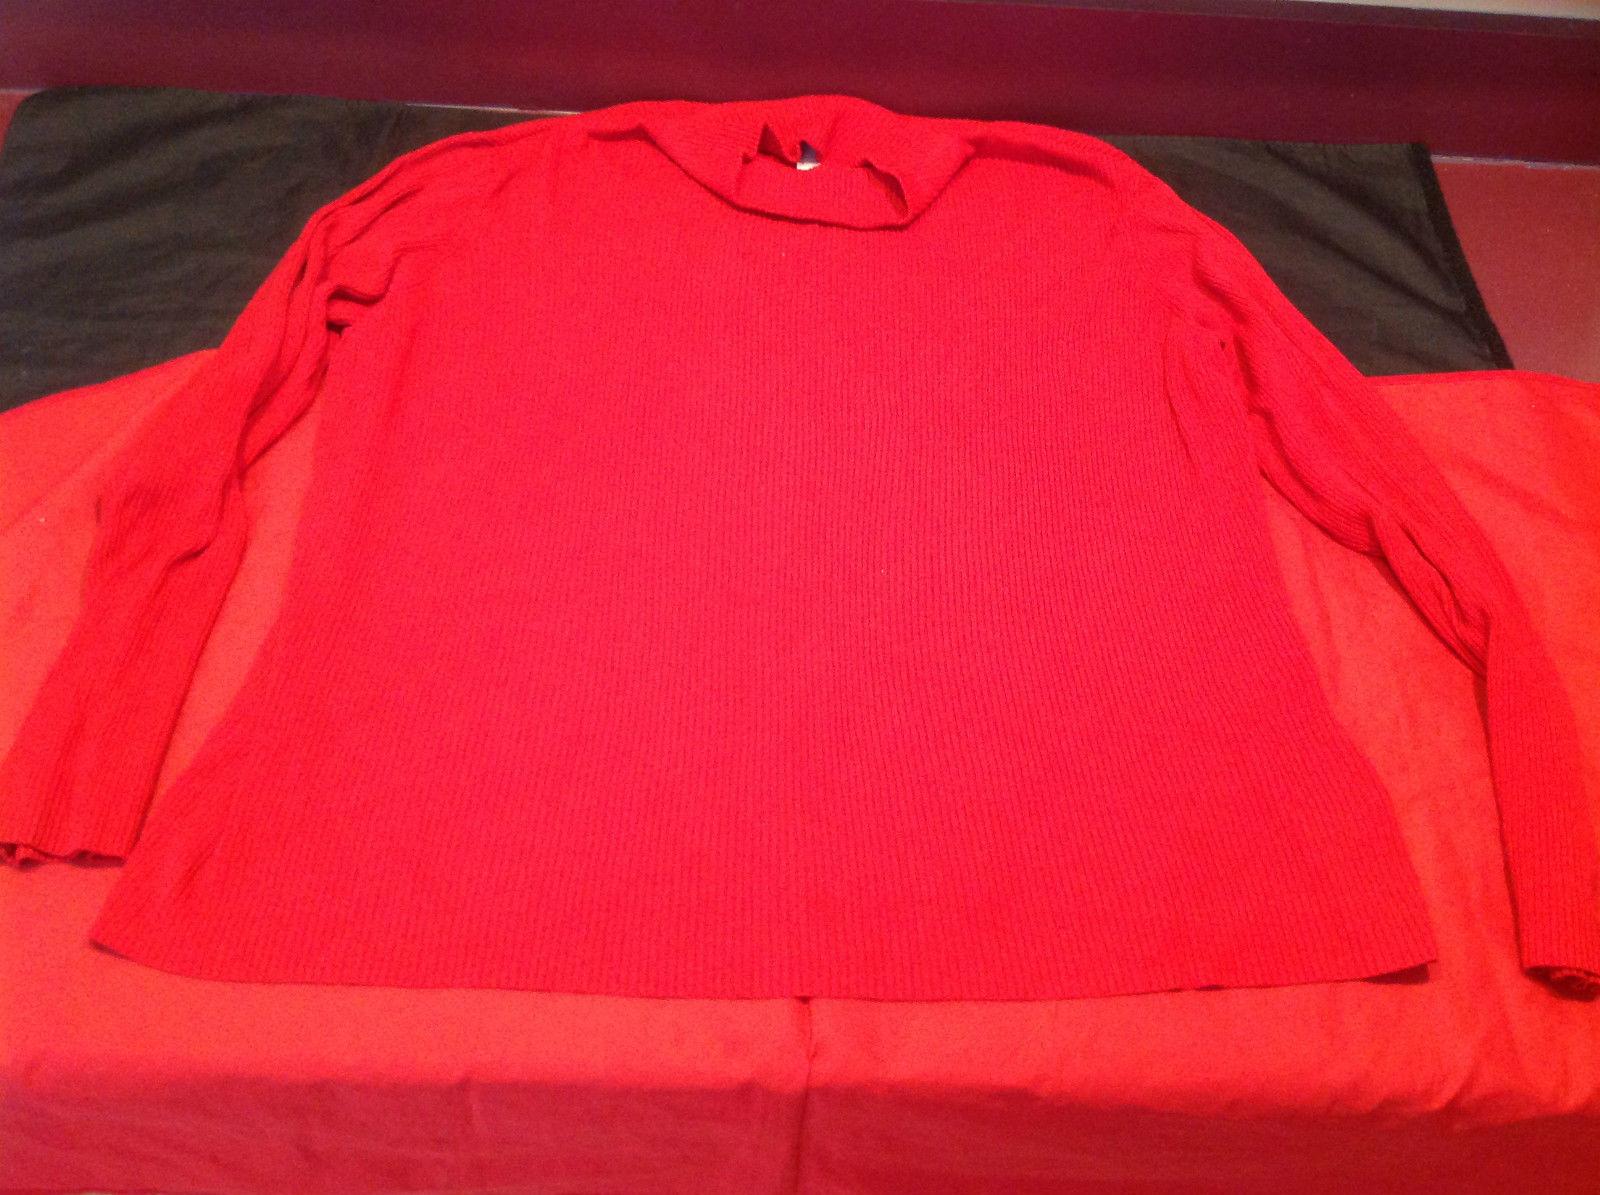 Ladies Long Sleeve Red Worthington Sweater Size 3X